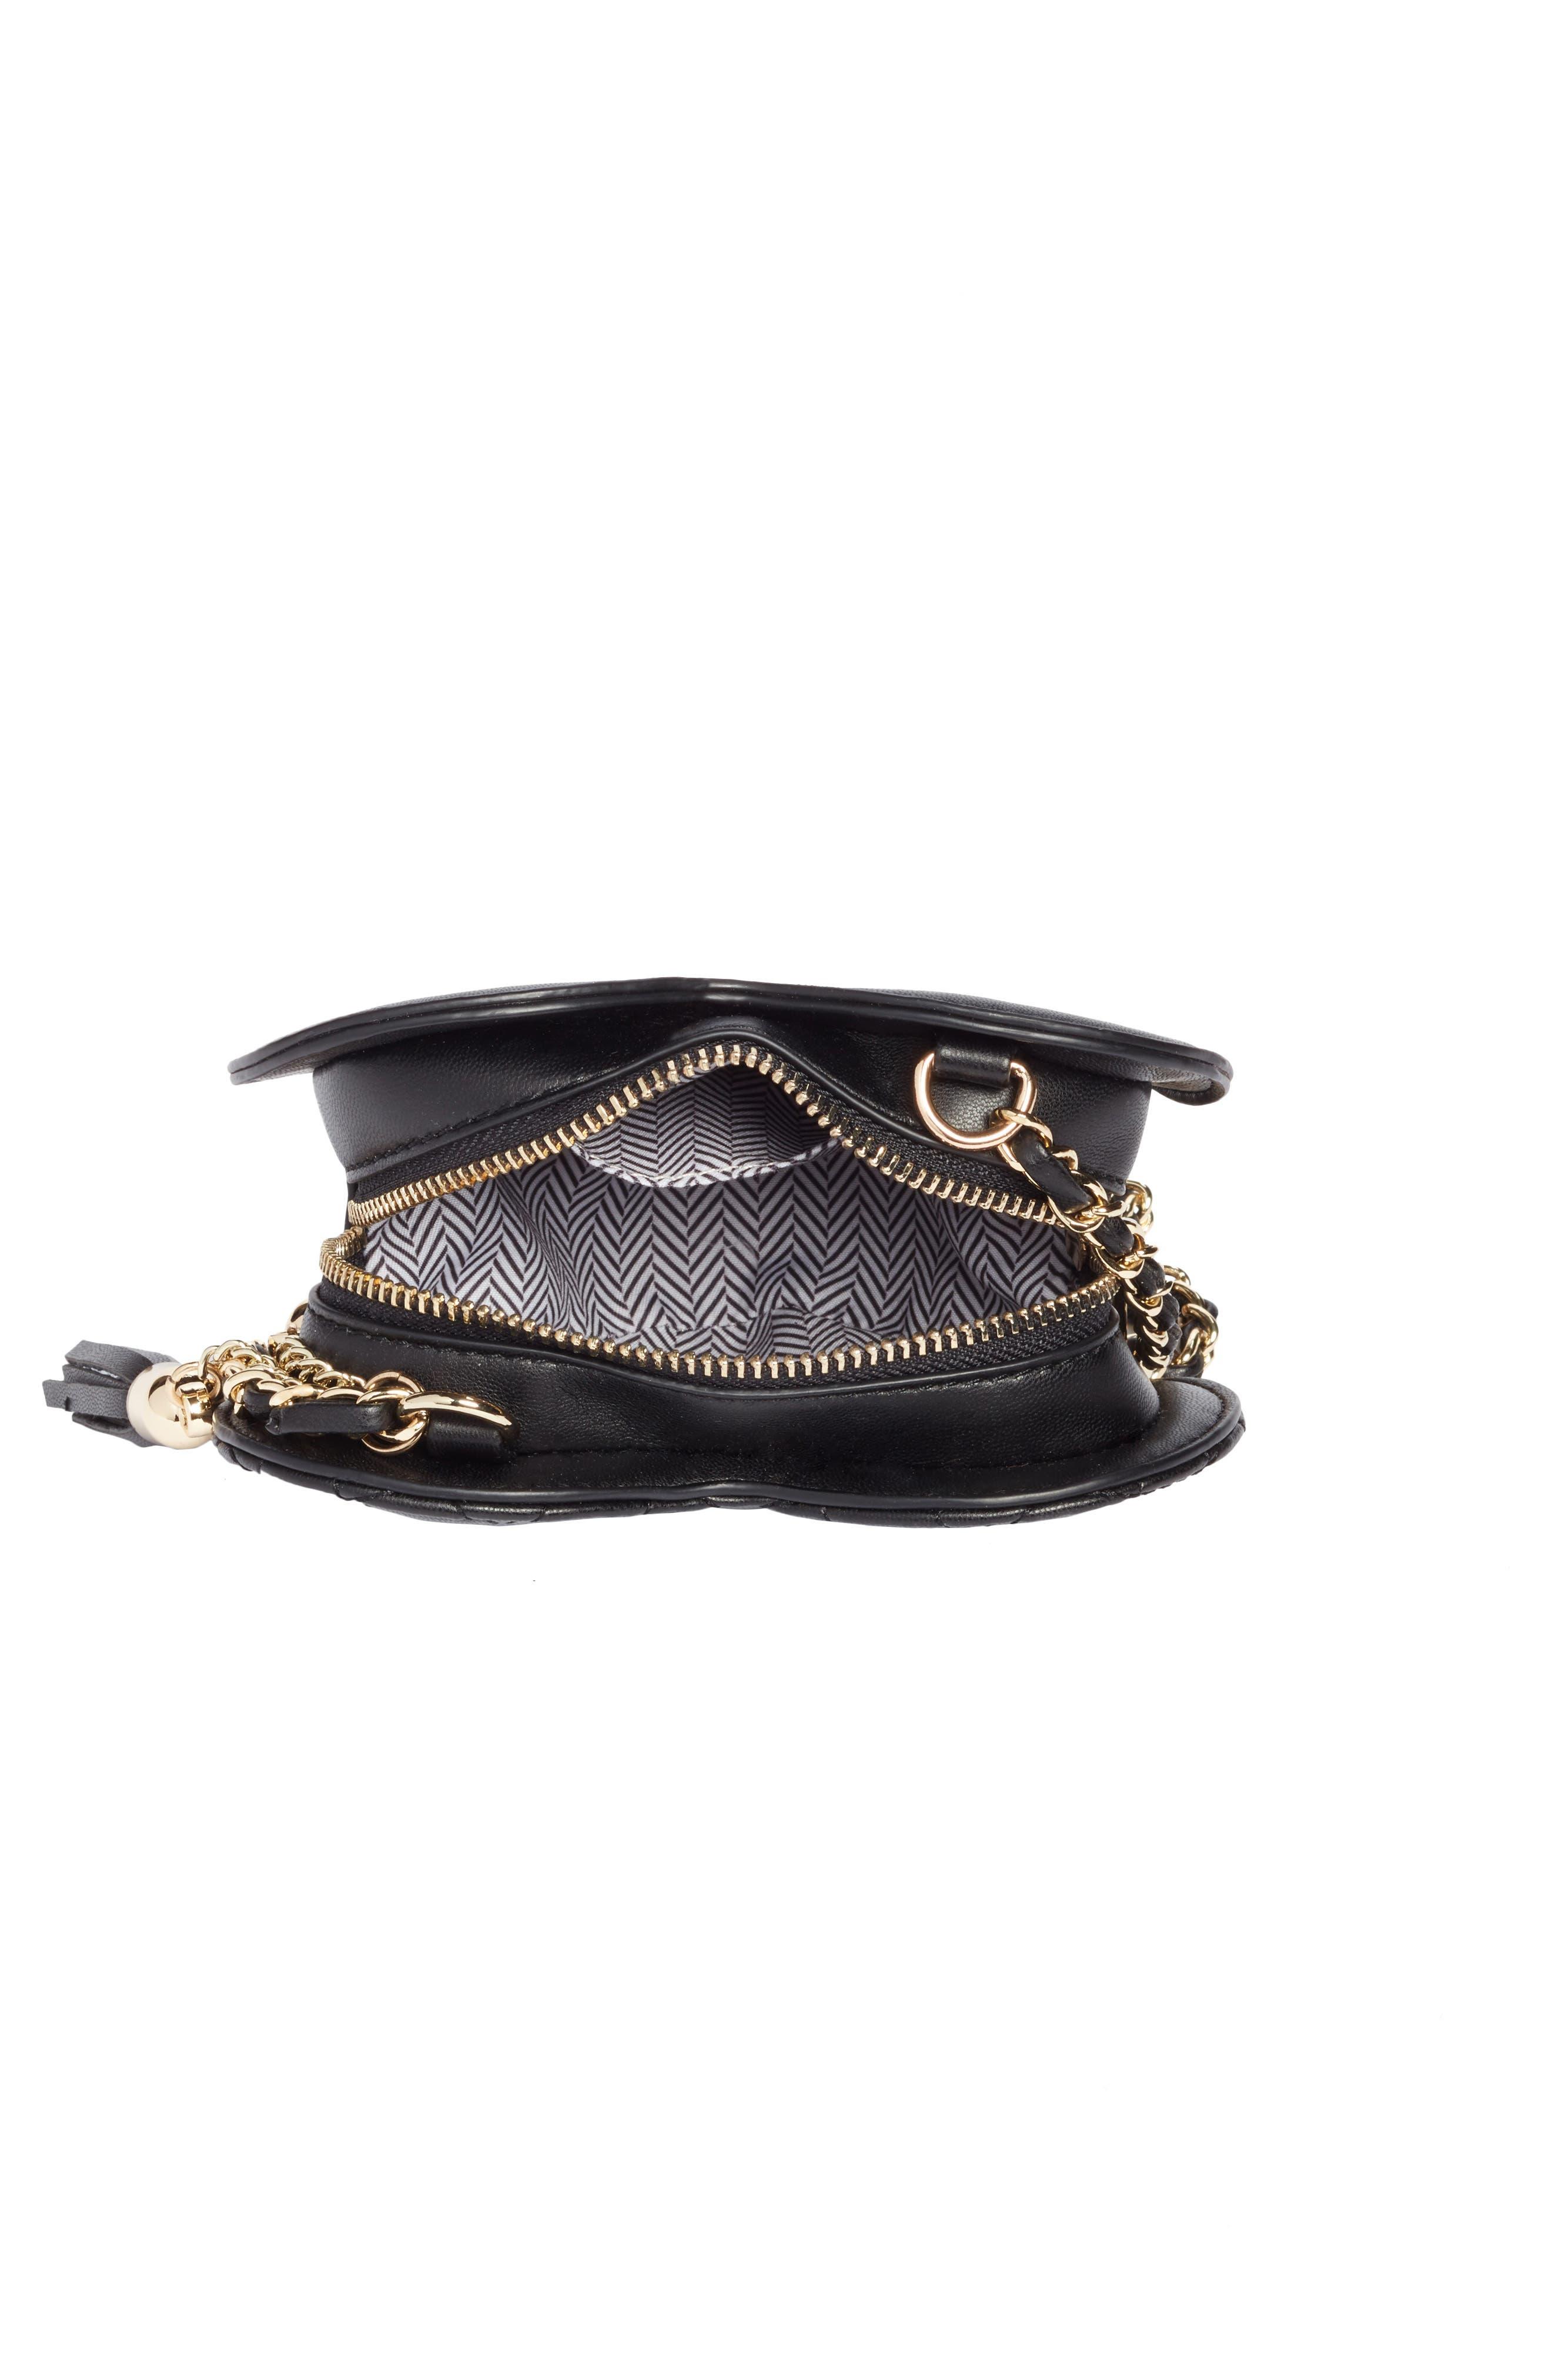 Mali + Lili Quilted Heart Vegan Leather Crossbody Bag,                             Alternate thumbnail 4, color,                             Black